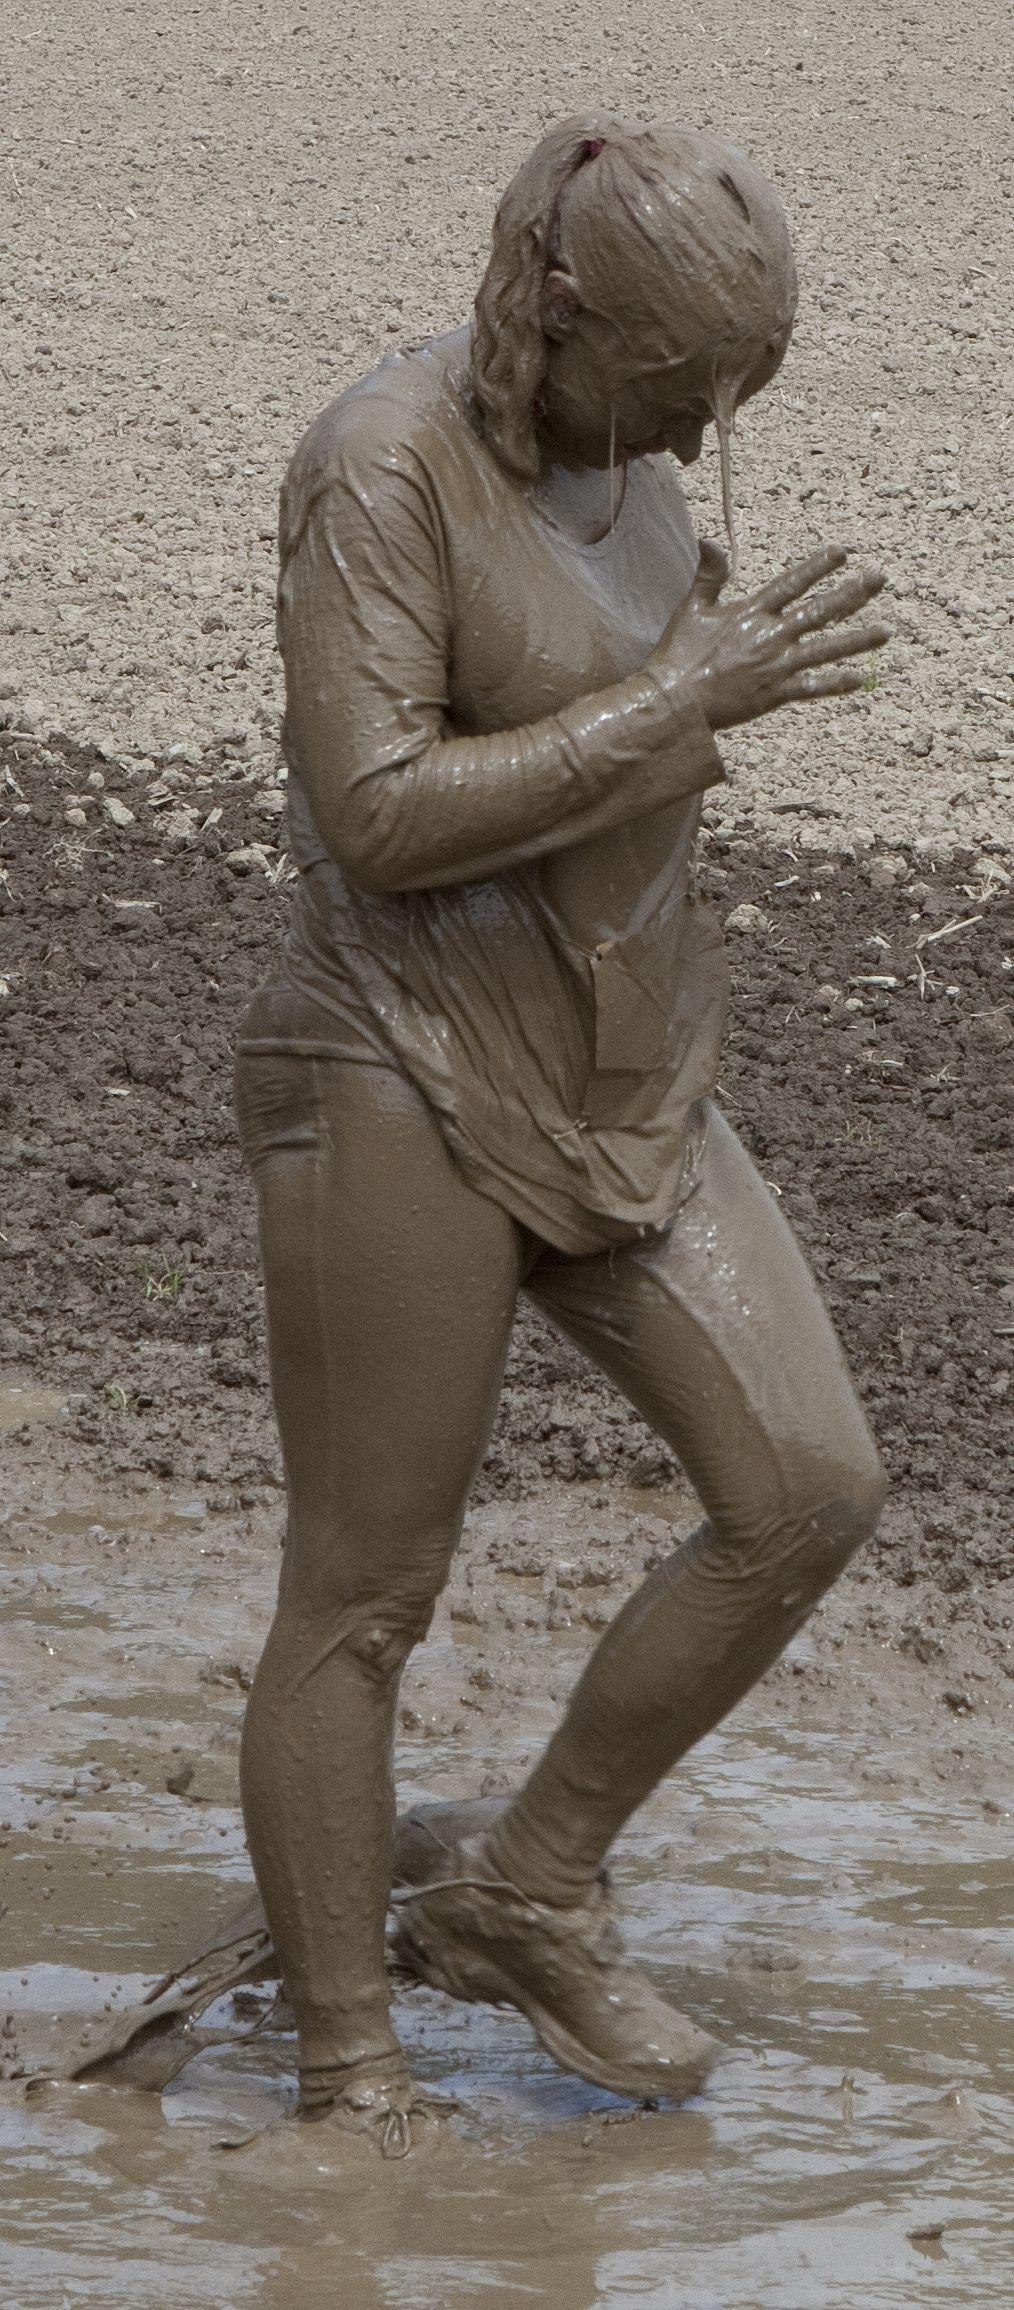 Mini skirt mud girl picture beauty girls